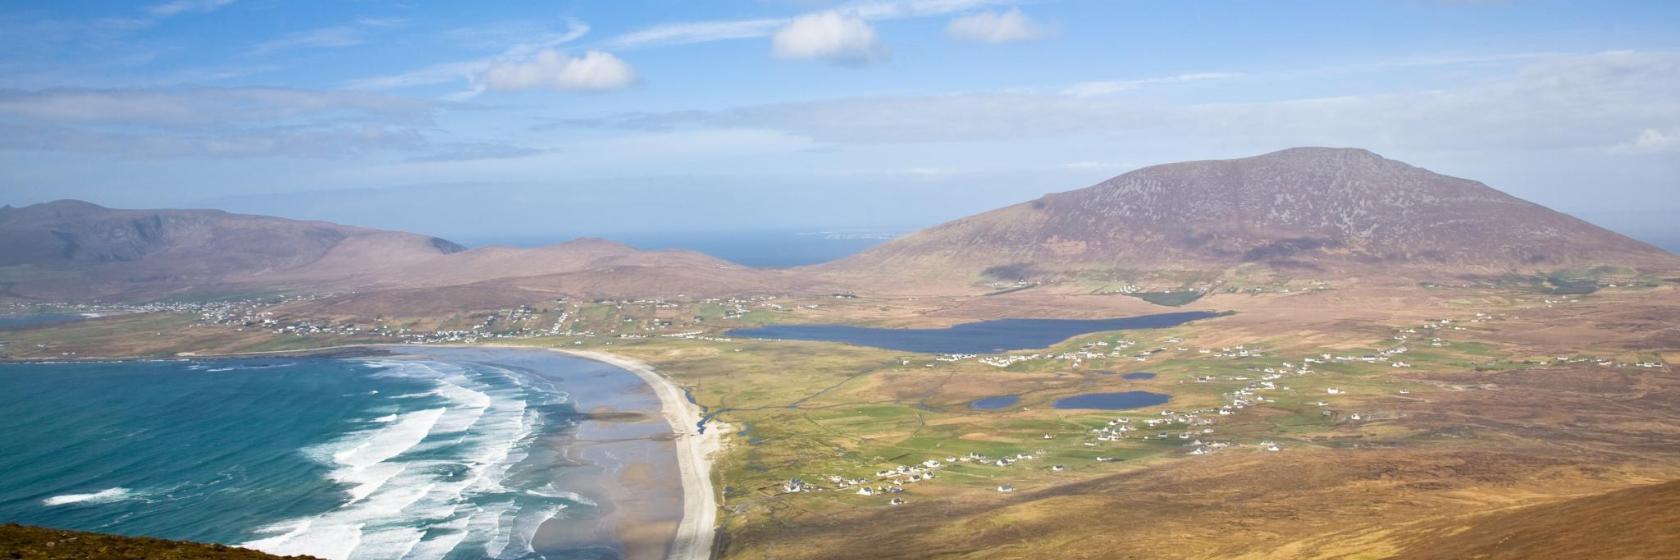 Teen Mantra, Castlebar | Events & Tickets | Map, Travel